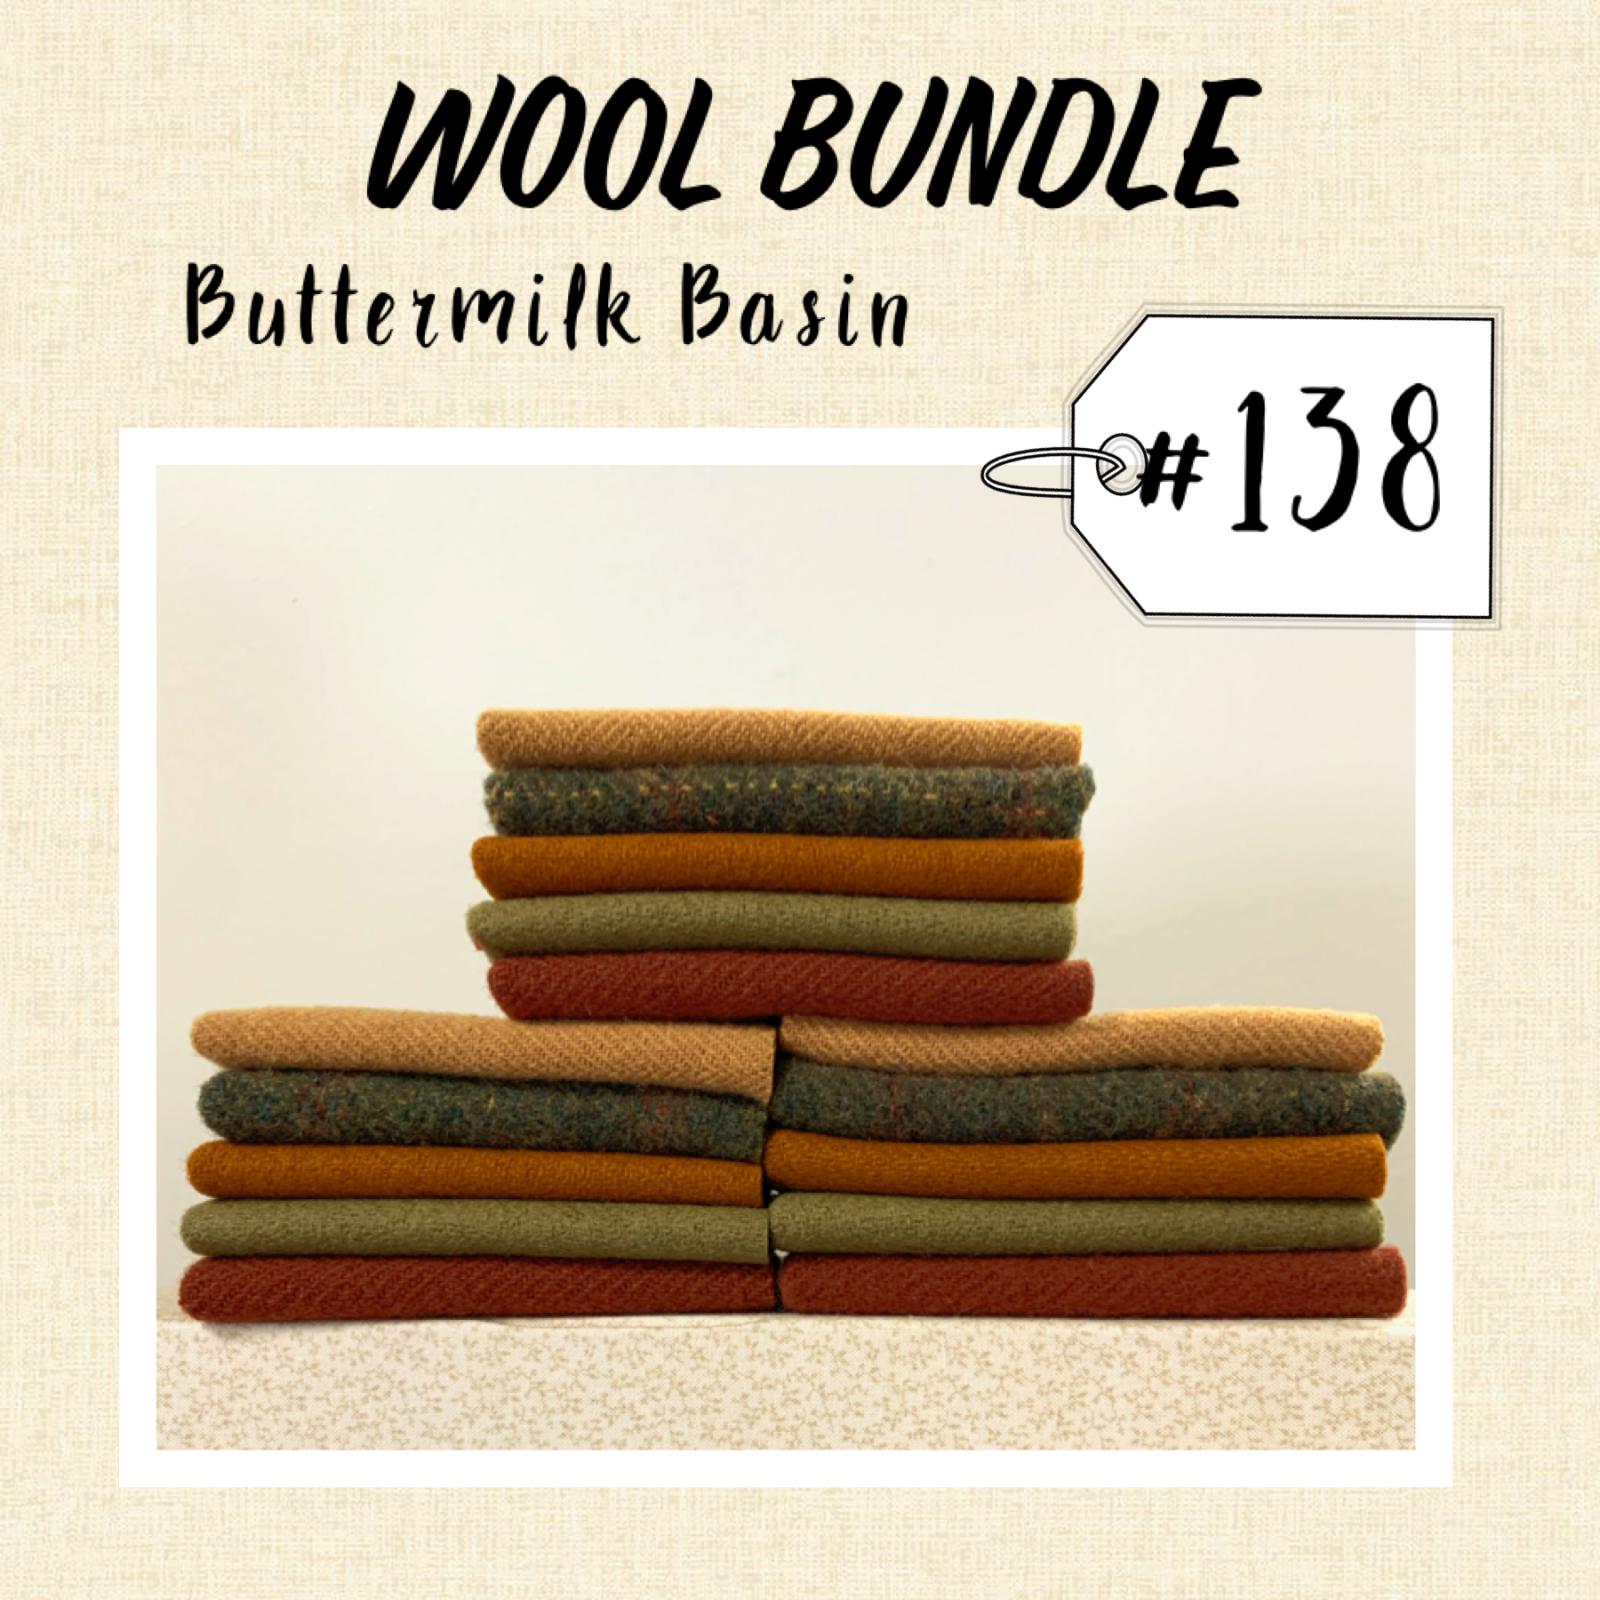 Wool Bundle #138B